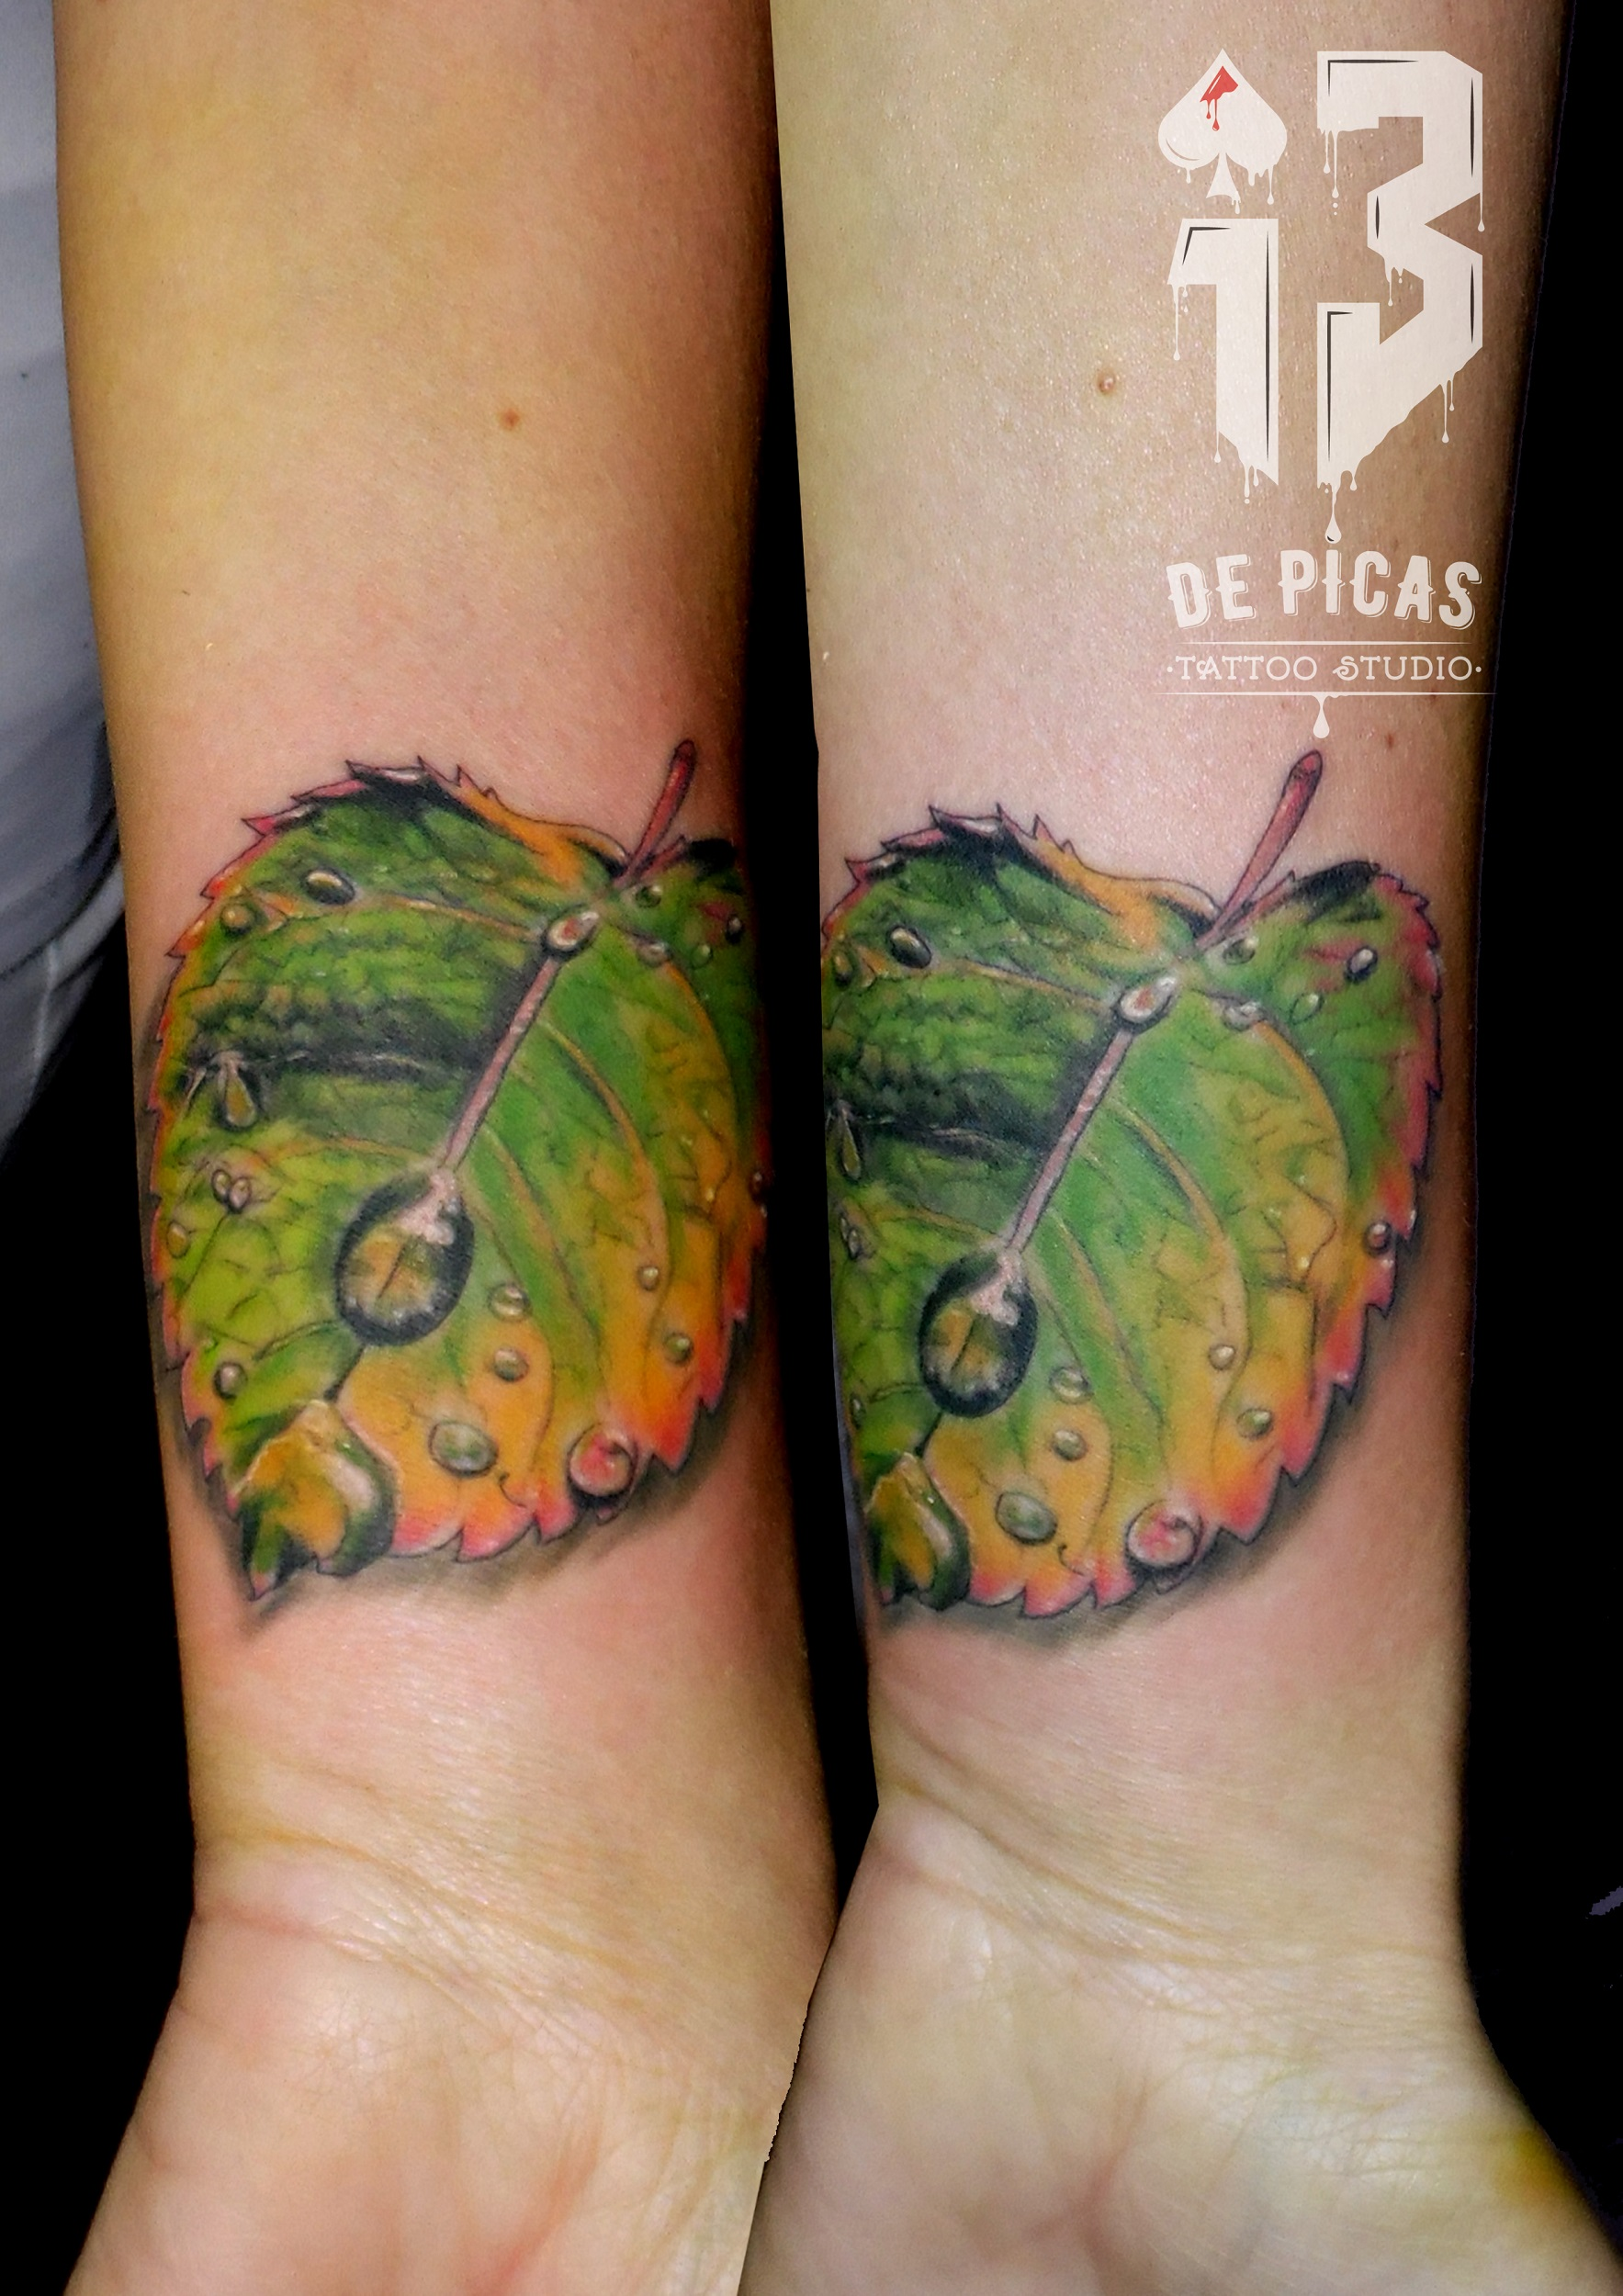 tatuaje tattoo realista color hoja gotas naturaleza arboles antebrazo 13depicas jaca huesca